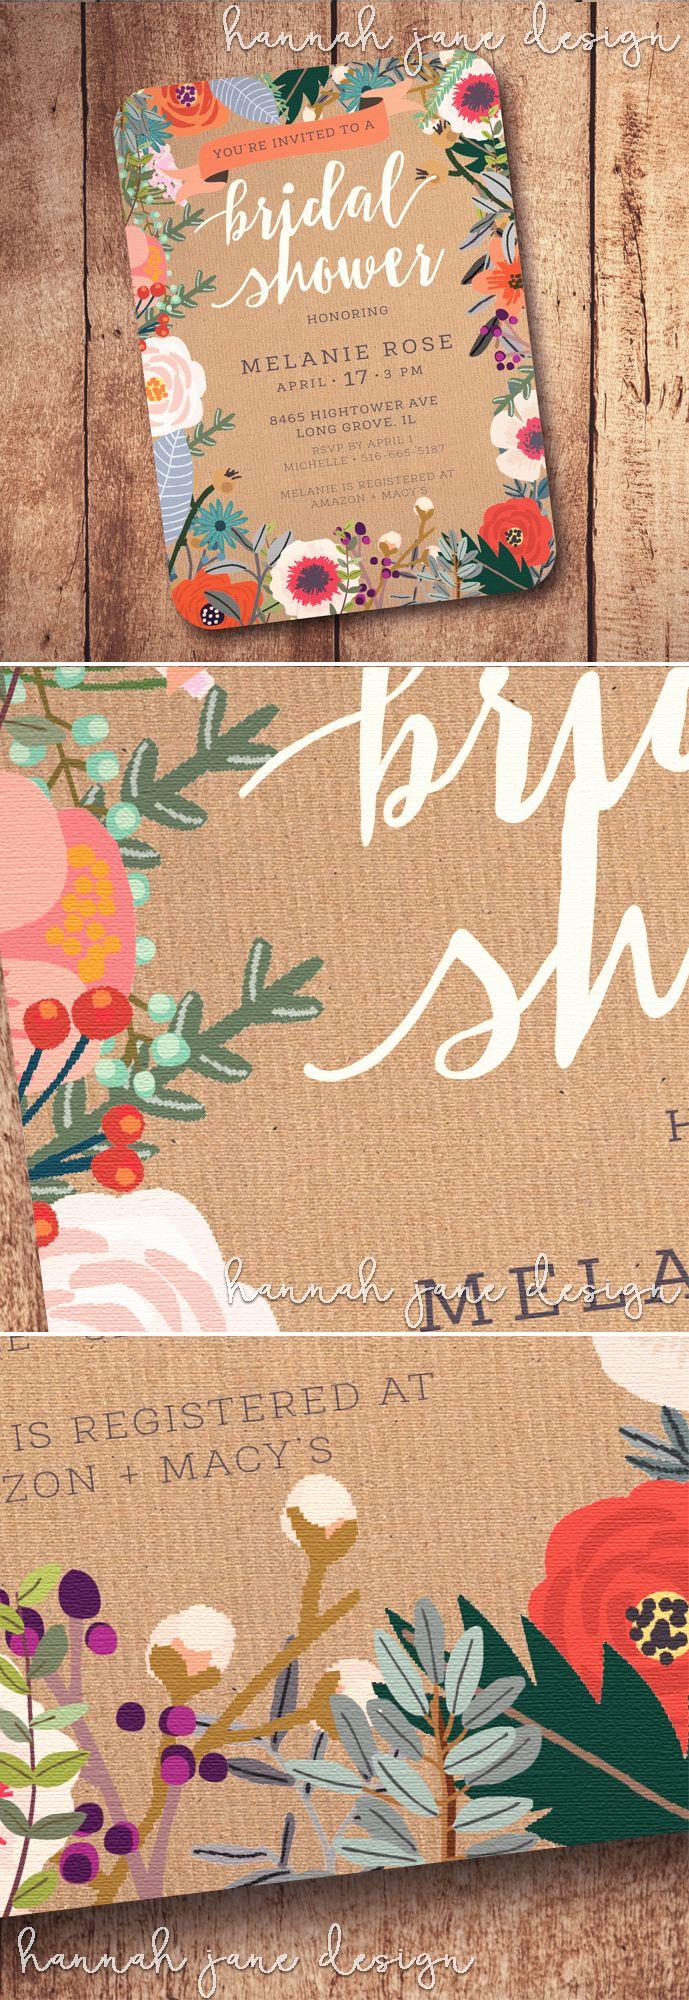 bridal shower invitations vector free%0A Rustic Shabby Chic Bridal Shower Theme  bright stylish bridal shower  invitation printable is perfect for